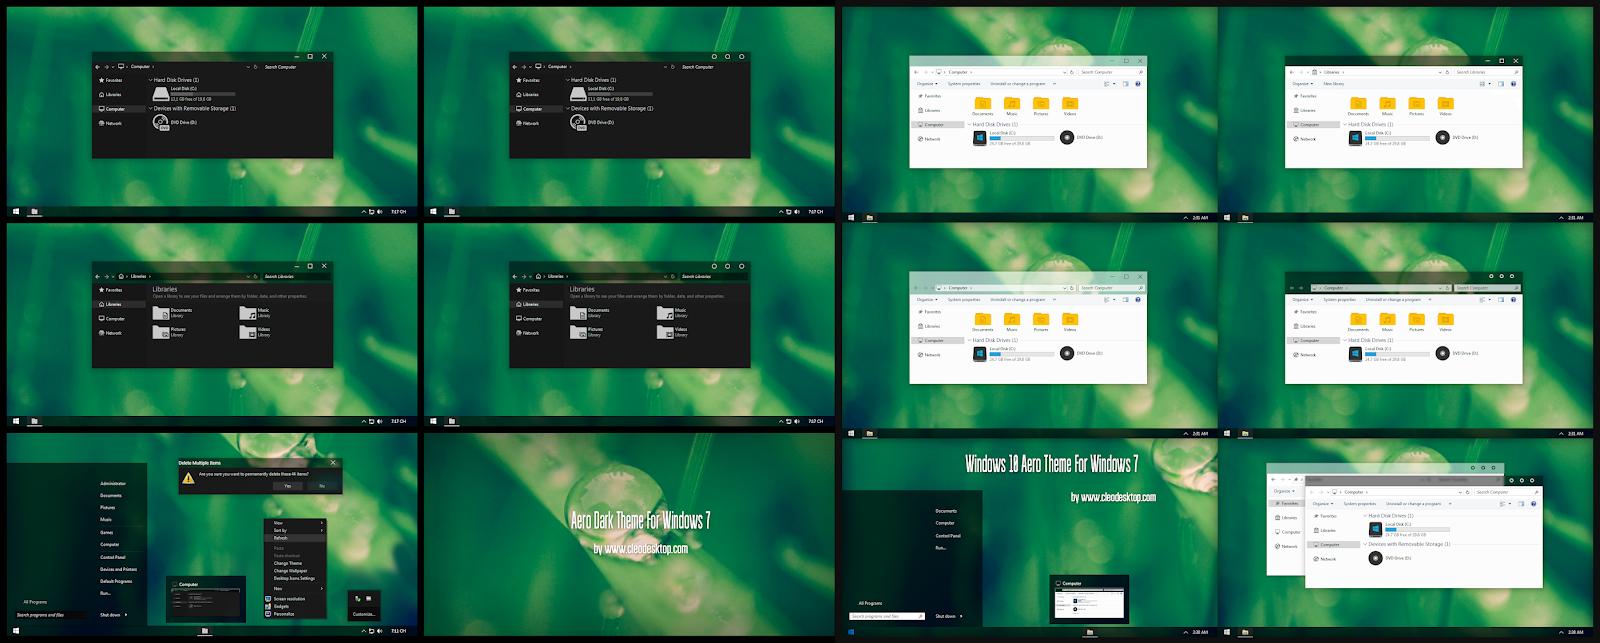 Aero Dark and Light Theme For Windows 7 - Cleodesktop I